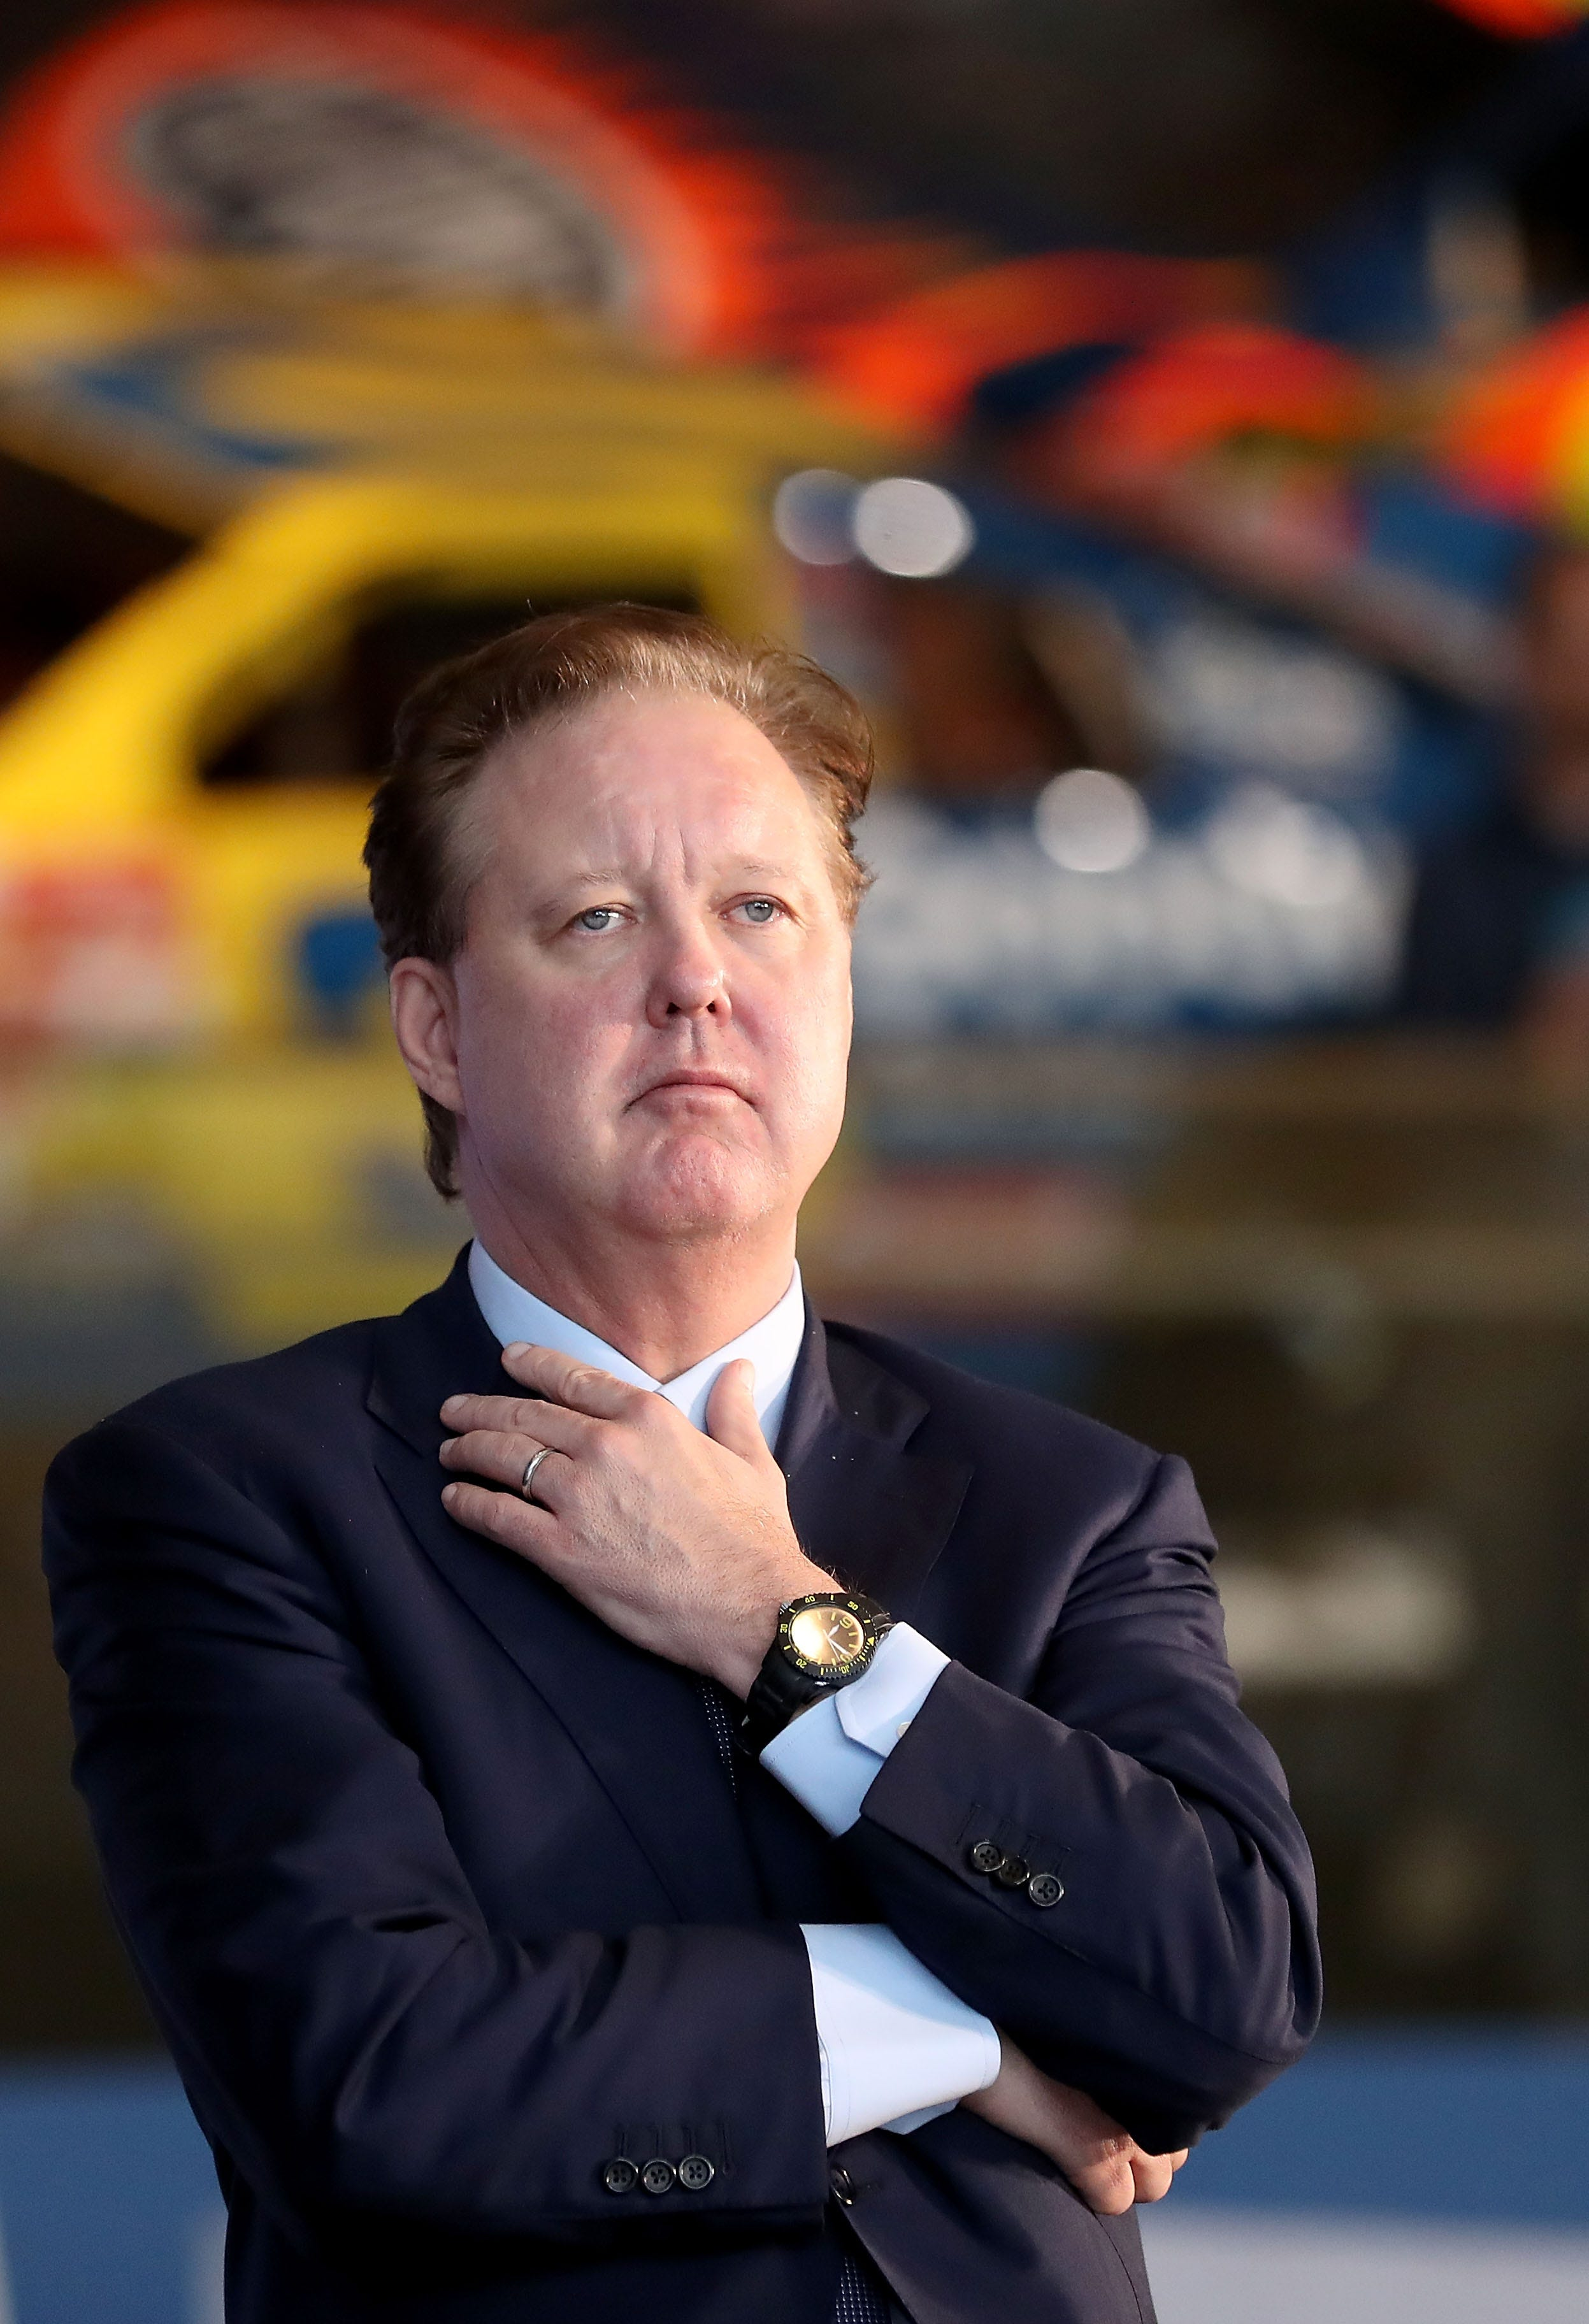 NASCAR CEO Brian France must step aside after DWI arrest